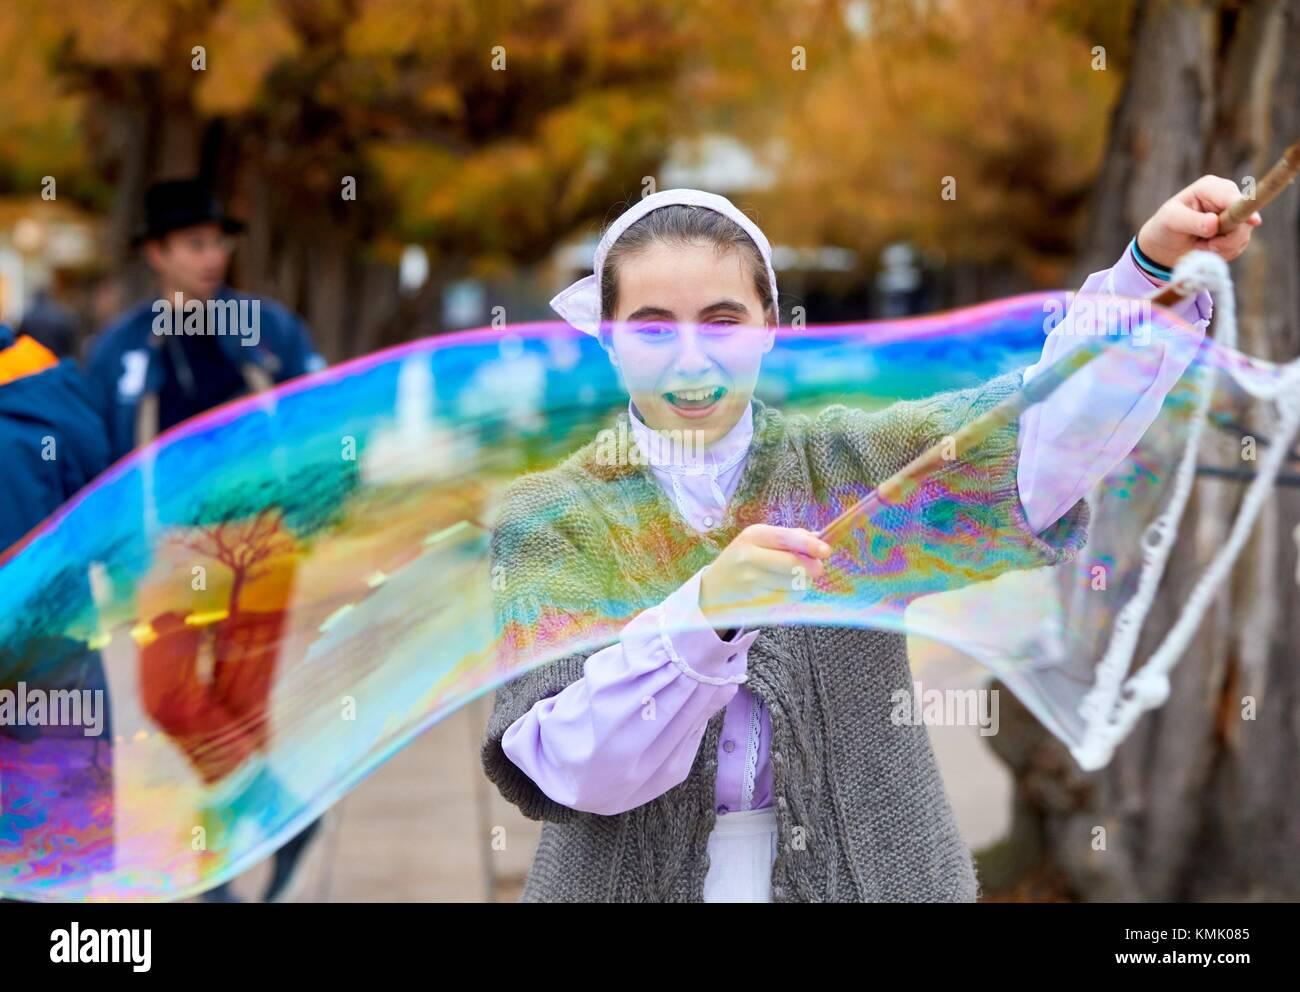 Soap bubbles, Basque regional costumes, Olentzero, Christmas, Donostia, San Sebastian, Gipuzkoa, Basque Country, - Stock Image